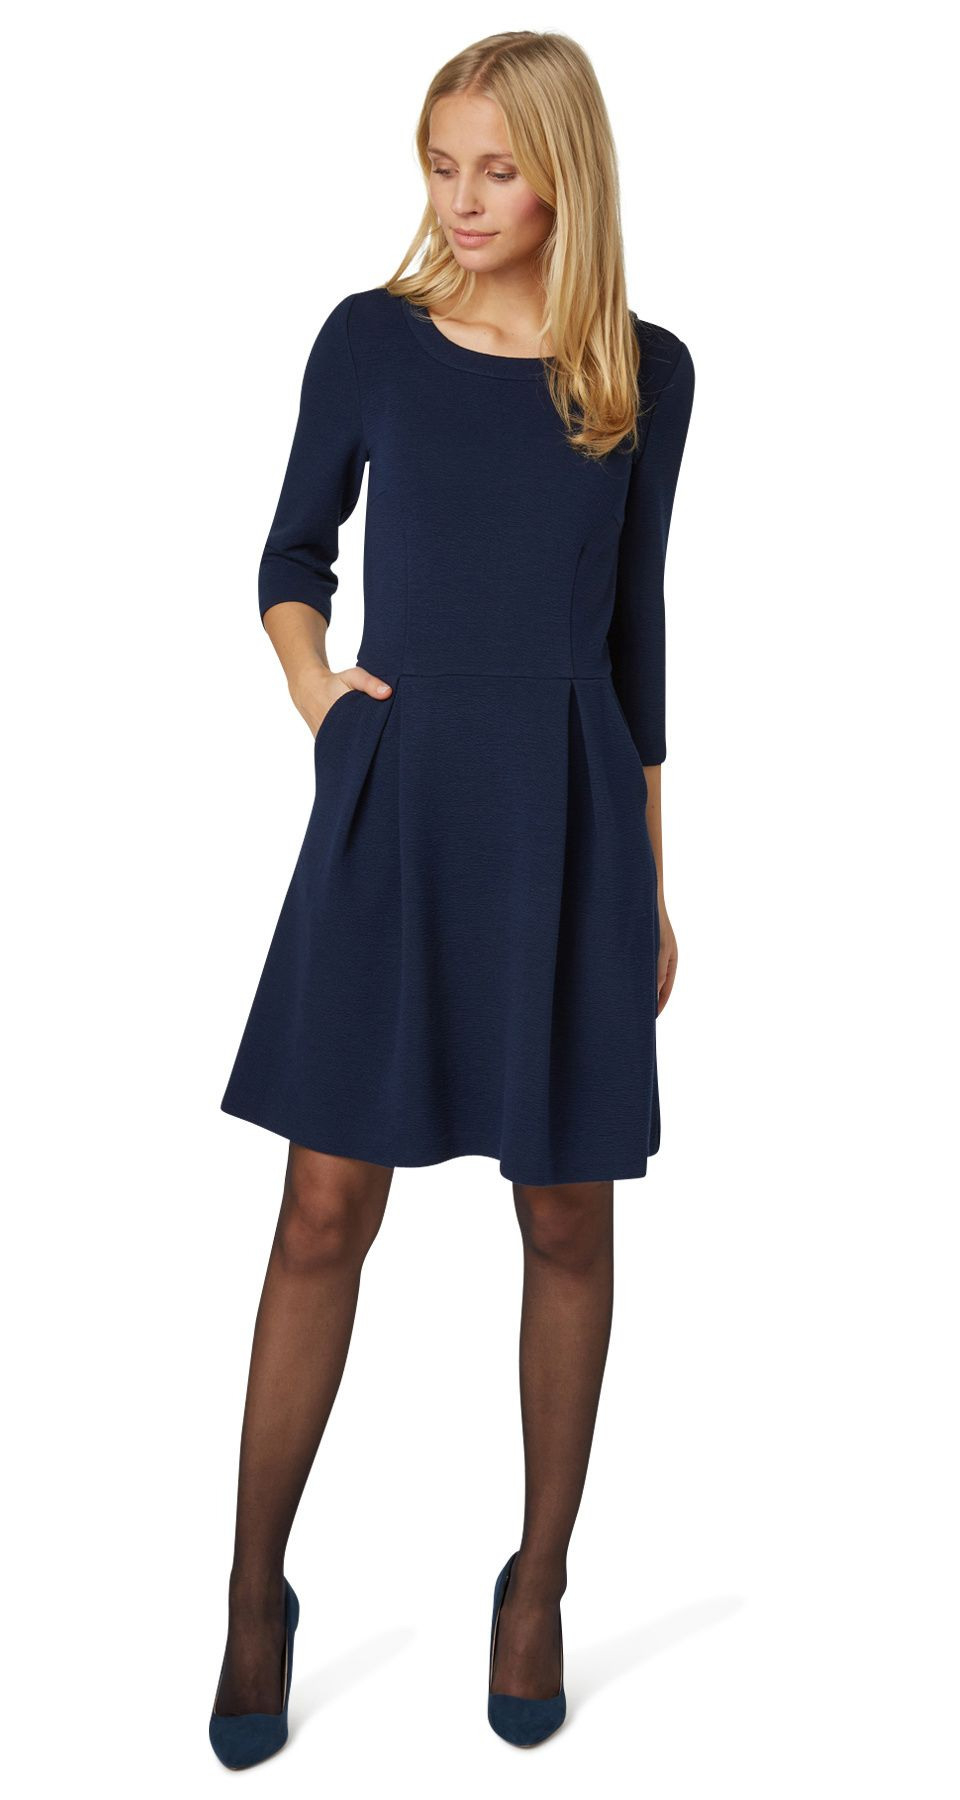 Feminine Textured Dress  Feminine Structure Dress From